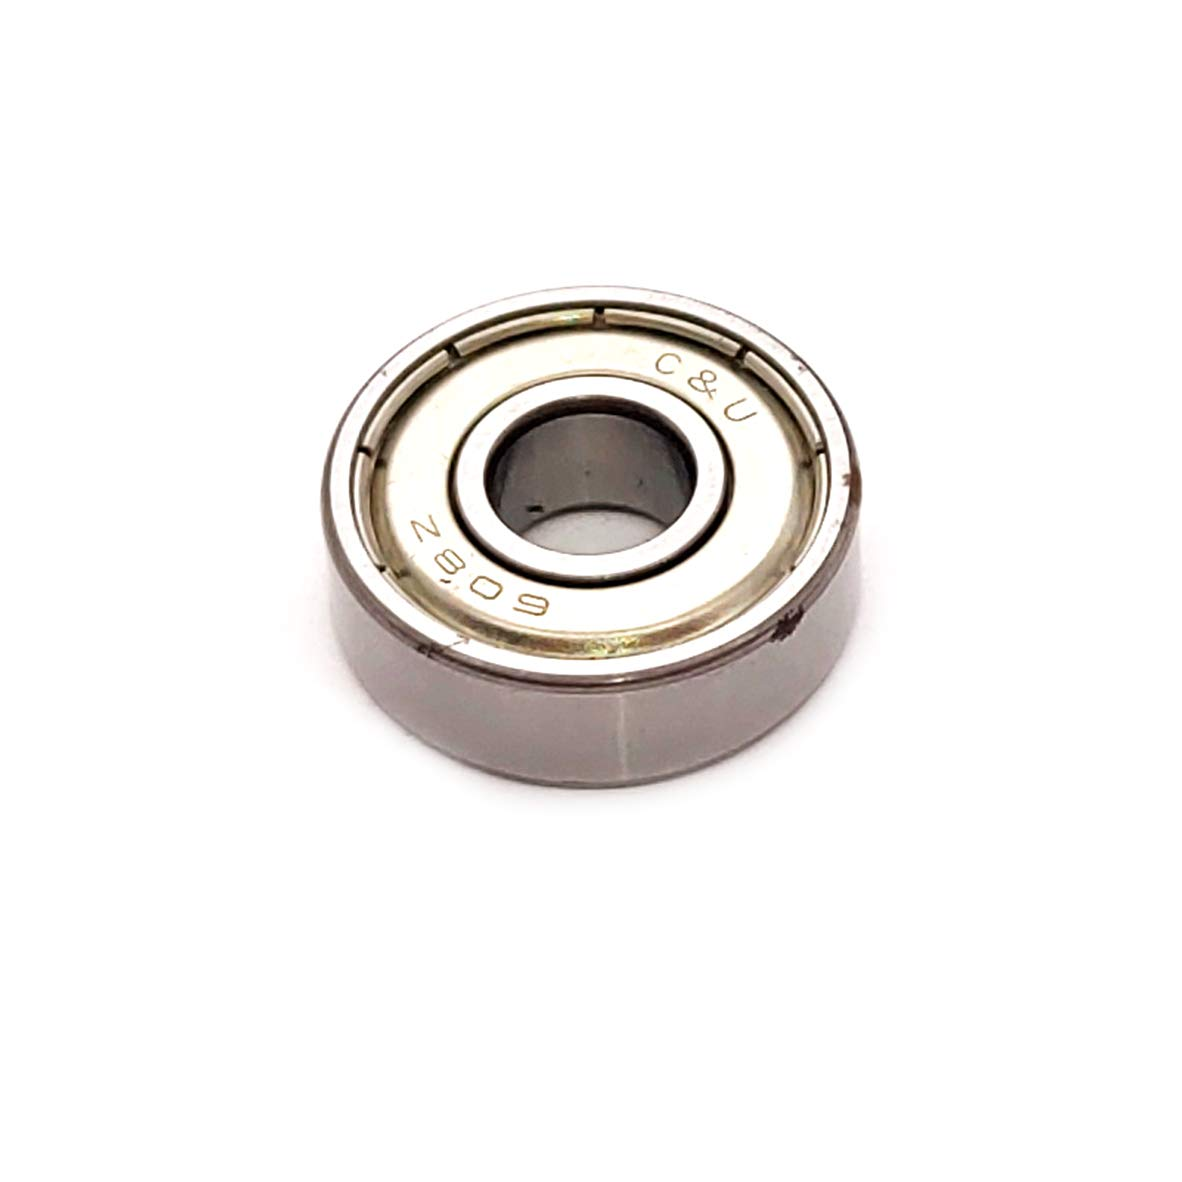 FKG 608-ZZ 8x22x7mm Deep Groove Ball Bearing Double Metal Shields Bearing Pre-Lubricated 10 Pcs